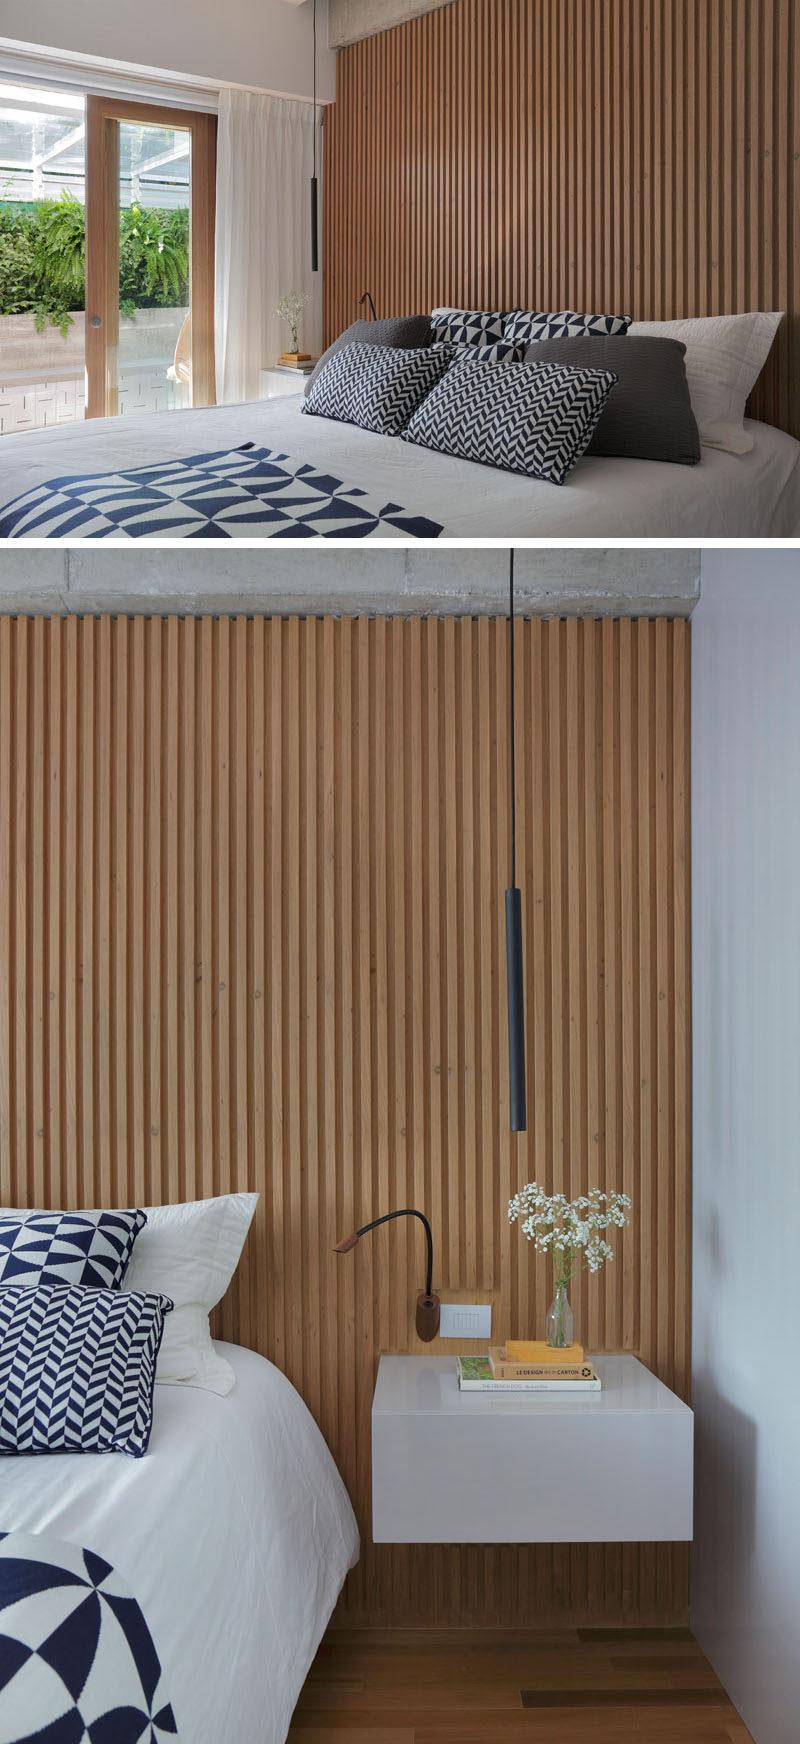 This Brazilian Apartments Interior Design Features Wood